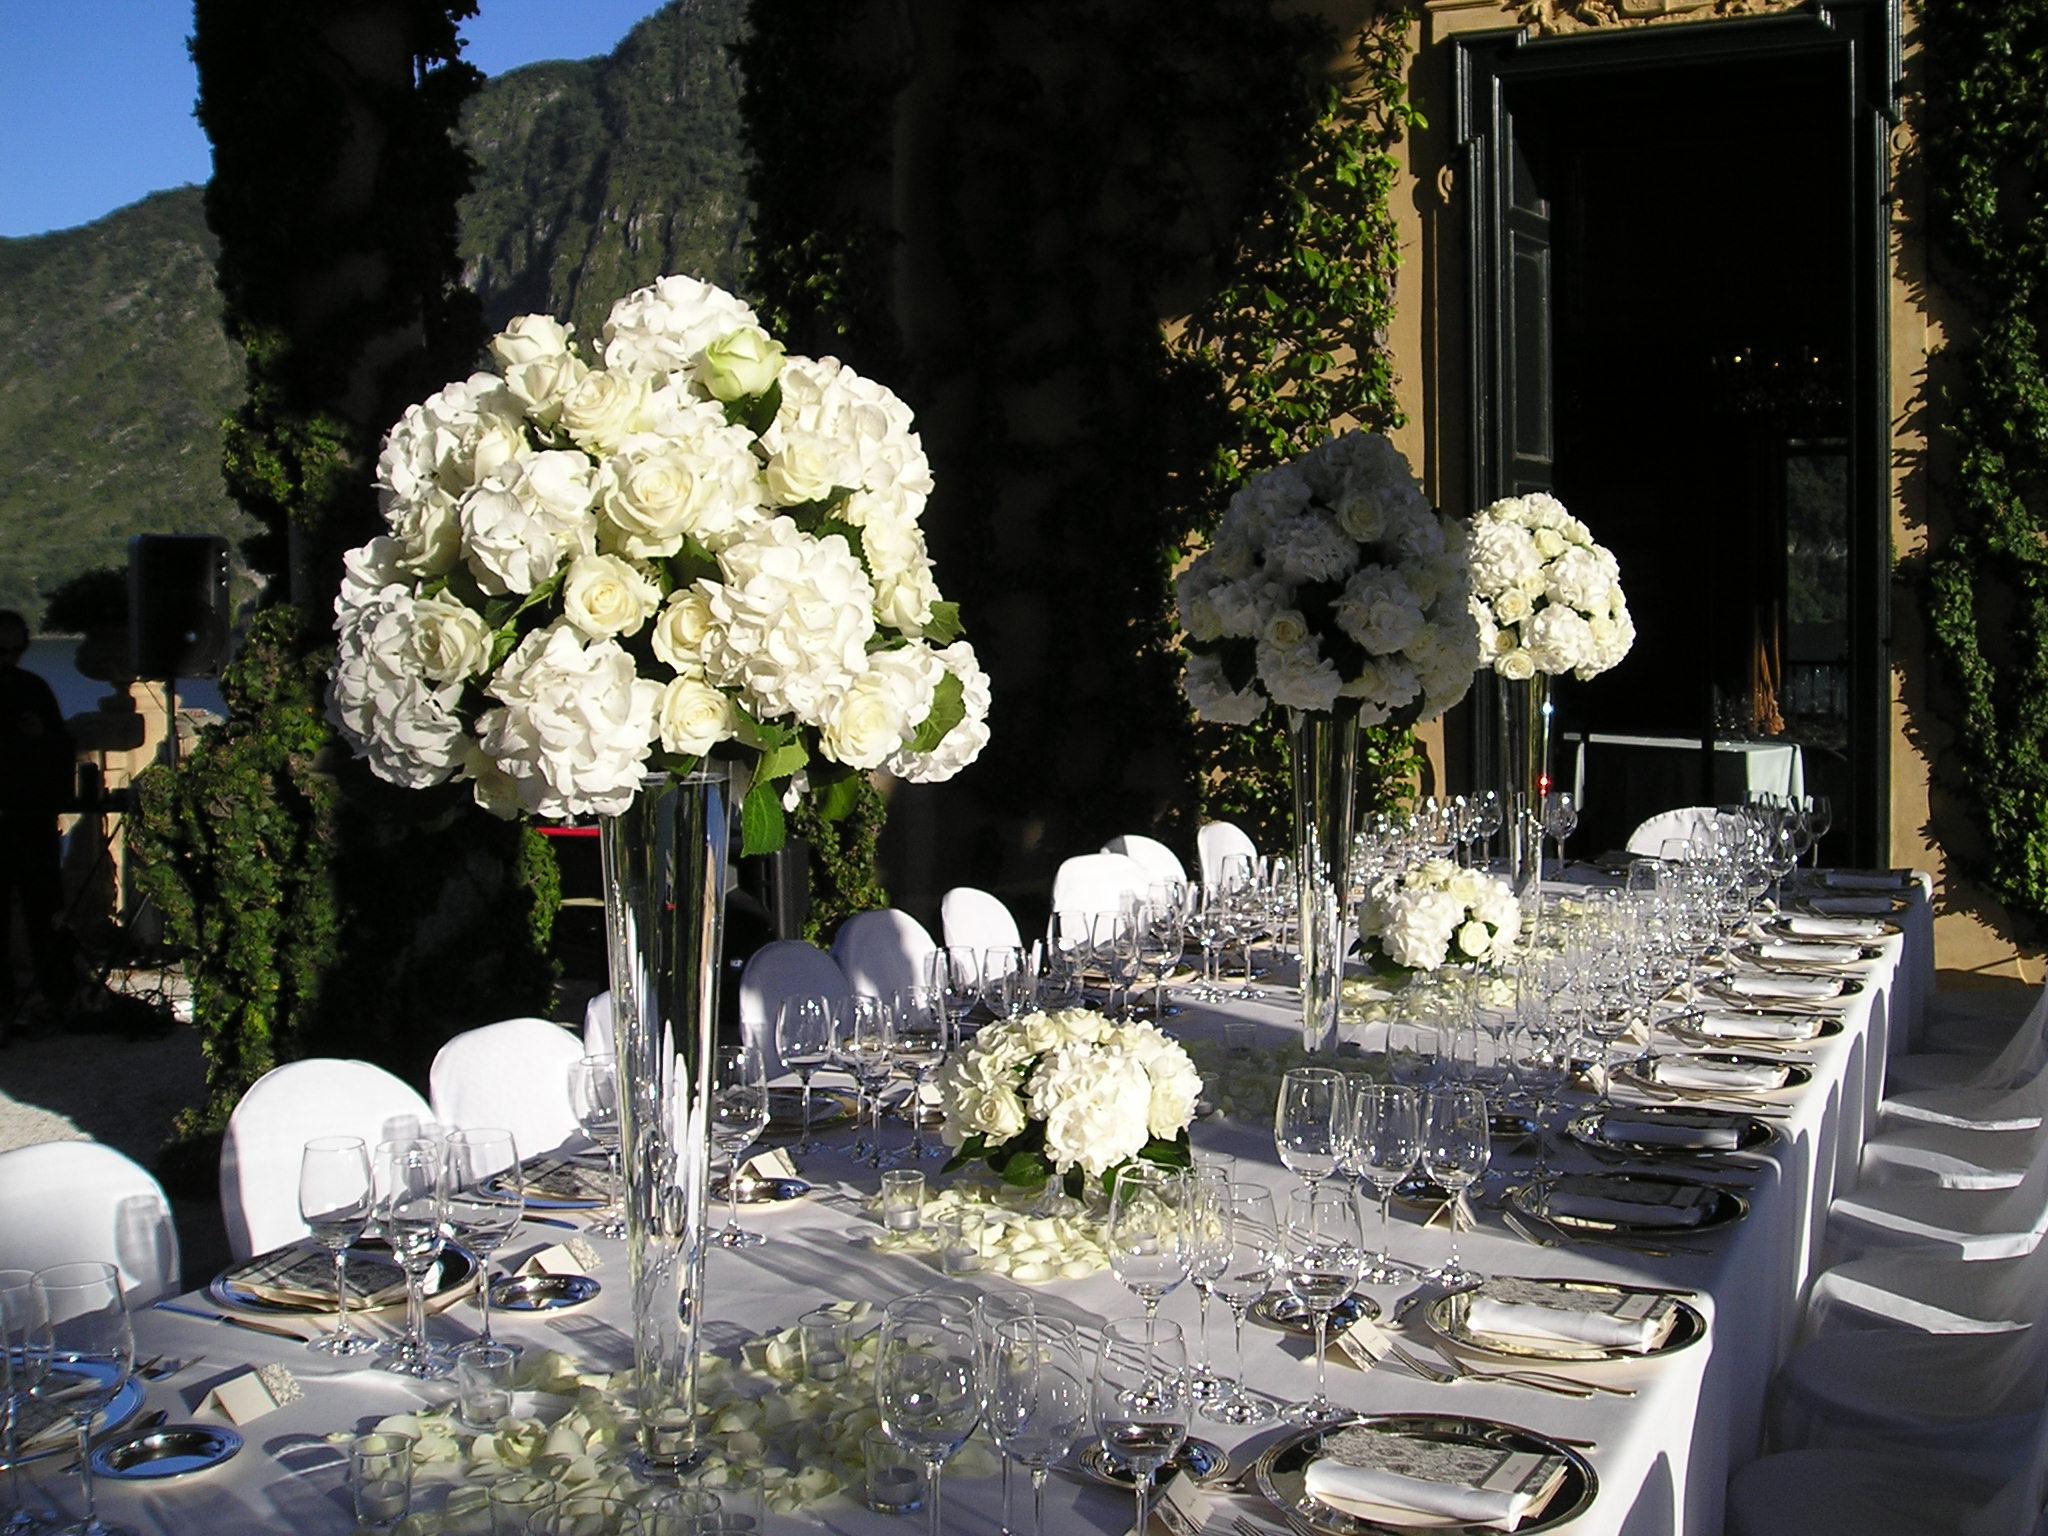 Vaso vetro alto ortensie pirovano mario fiori for Ortensie in vaso